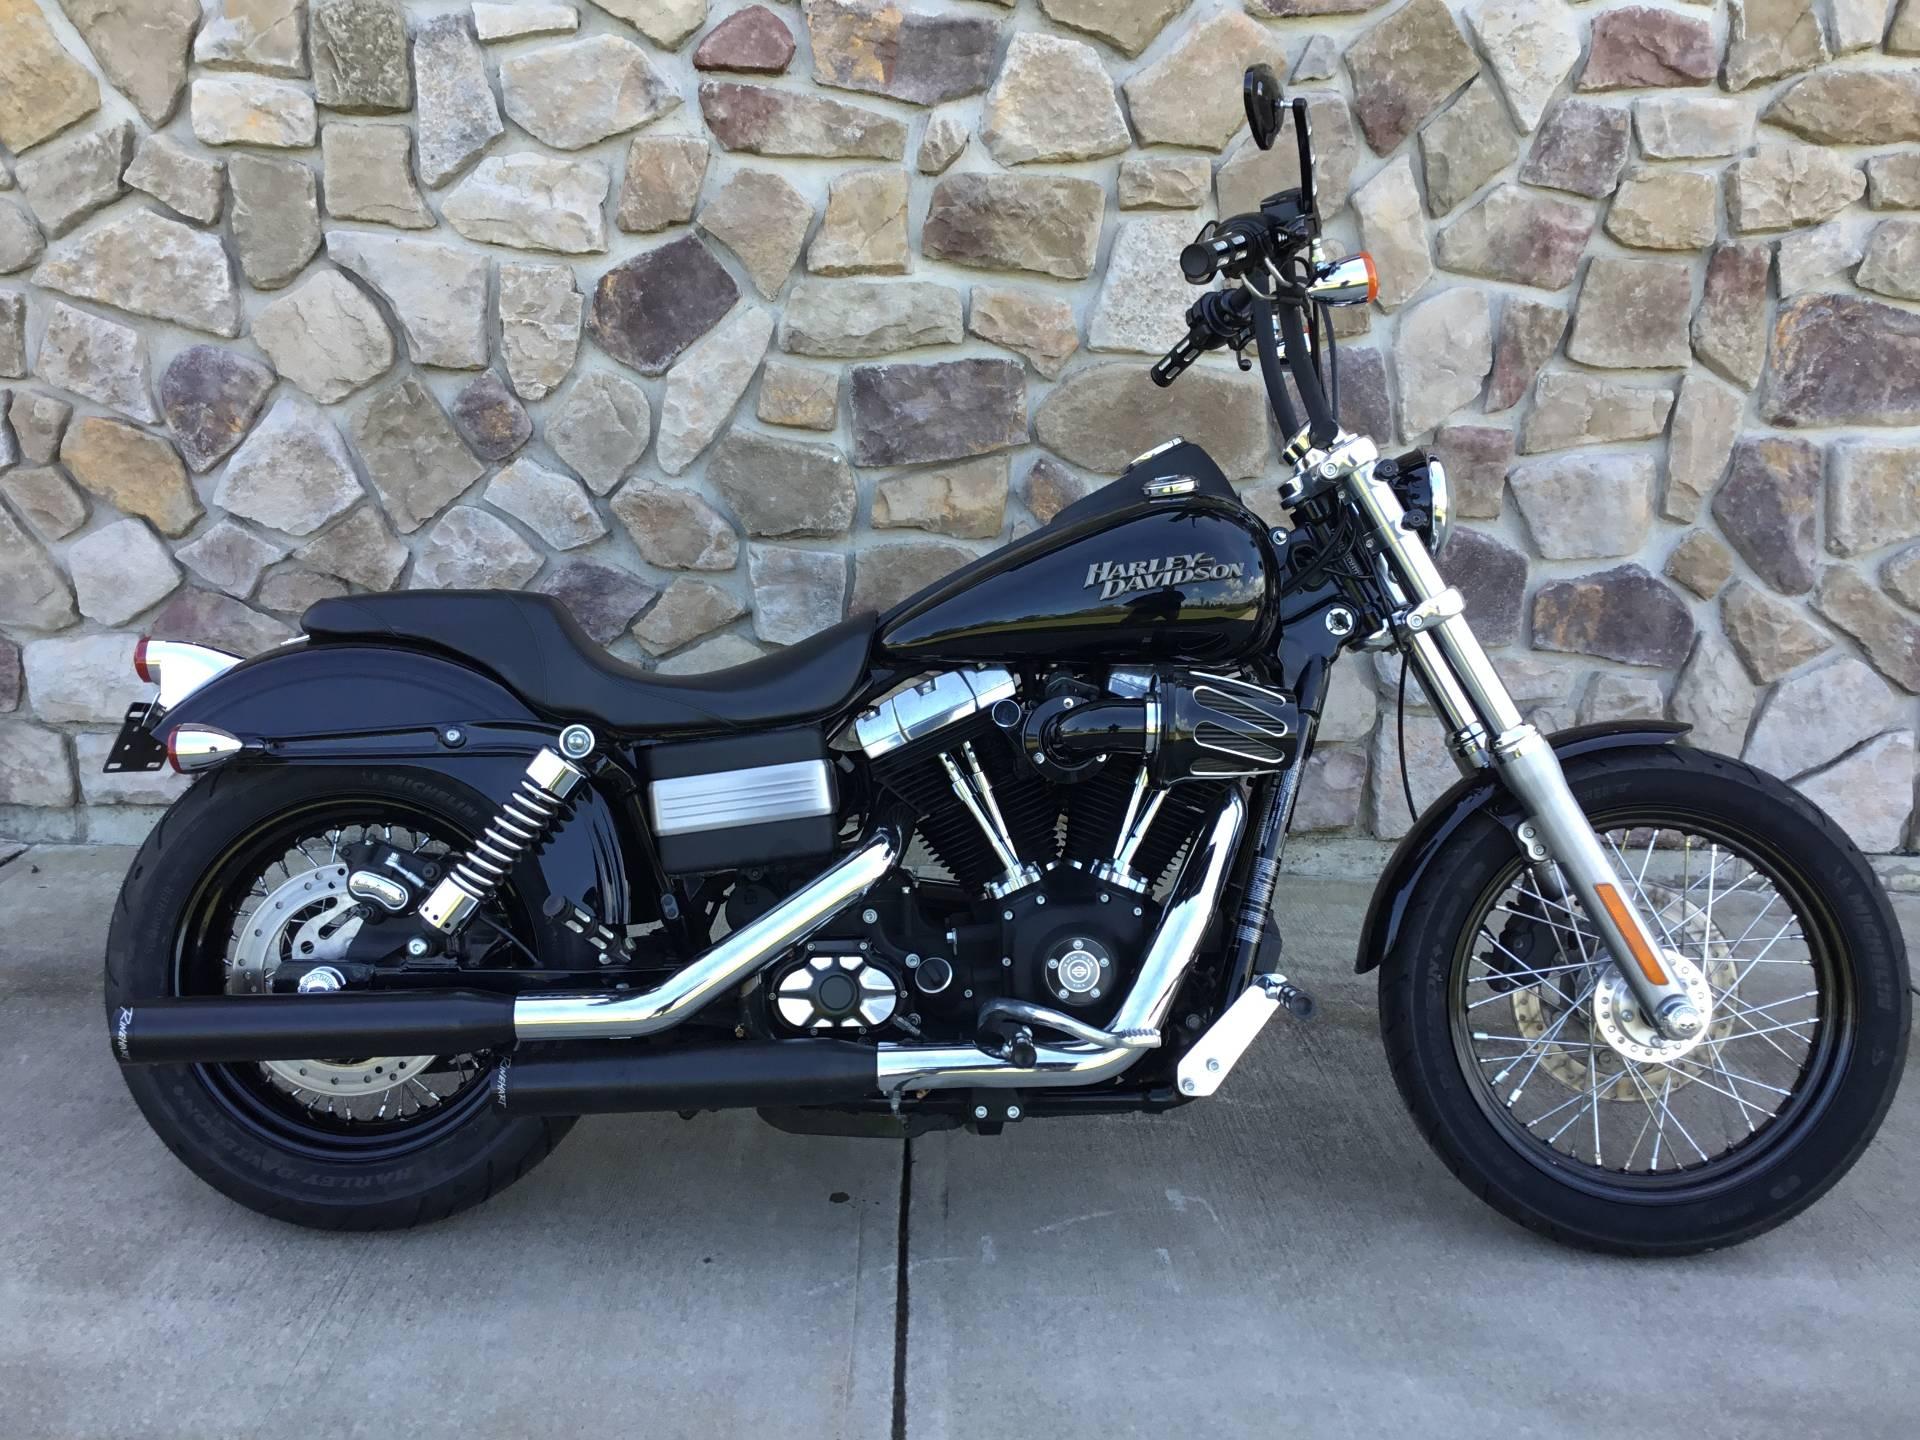 Dyna Street Bob >> 2012 Harley Davidson Dyna Street Bob Motorcycles Broadalbin New